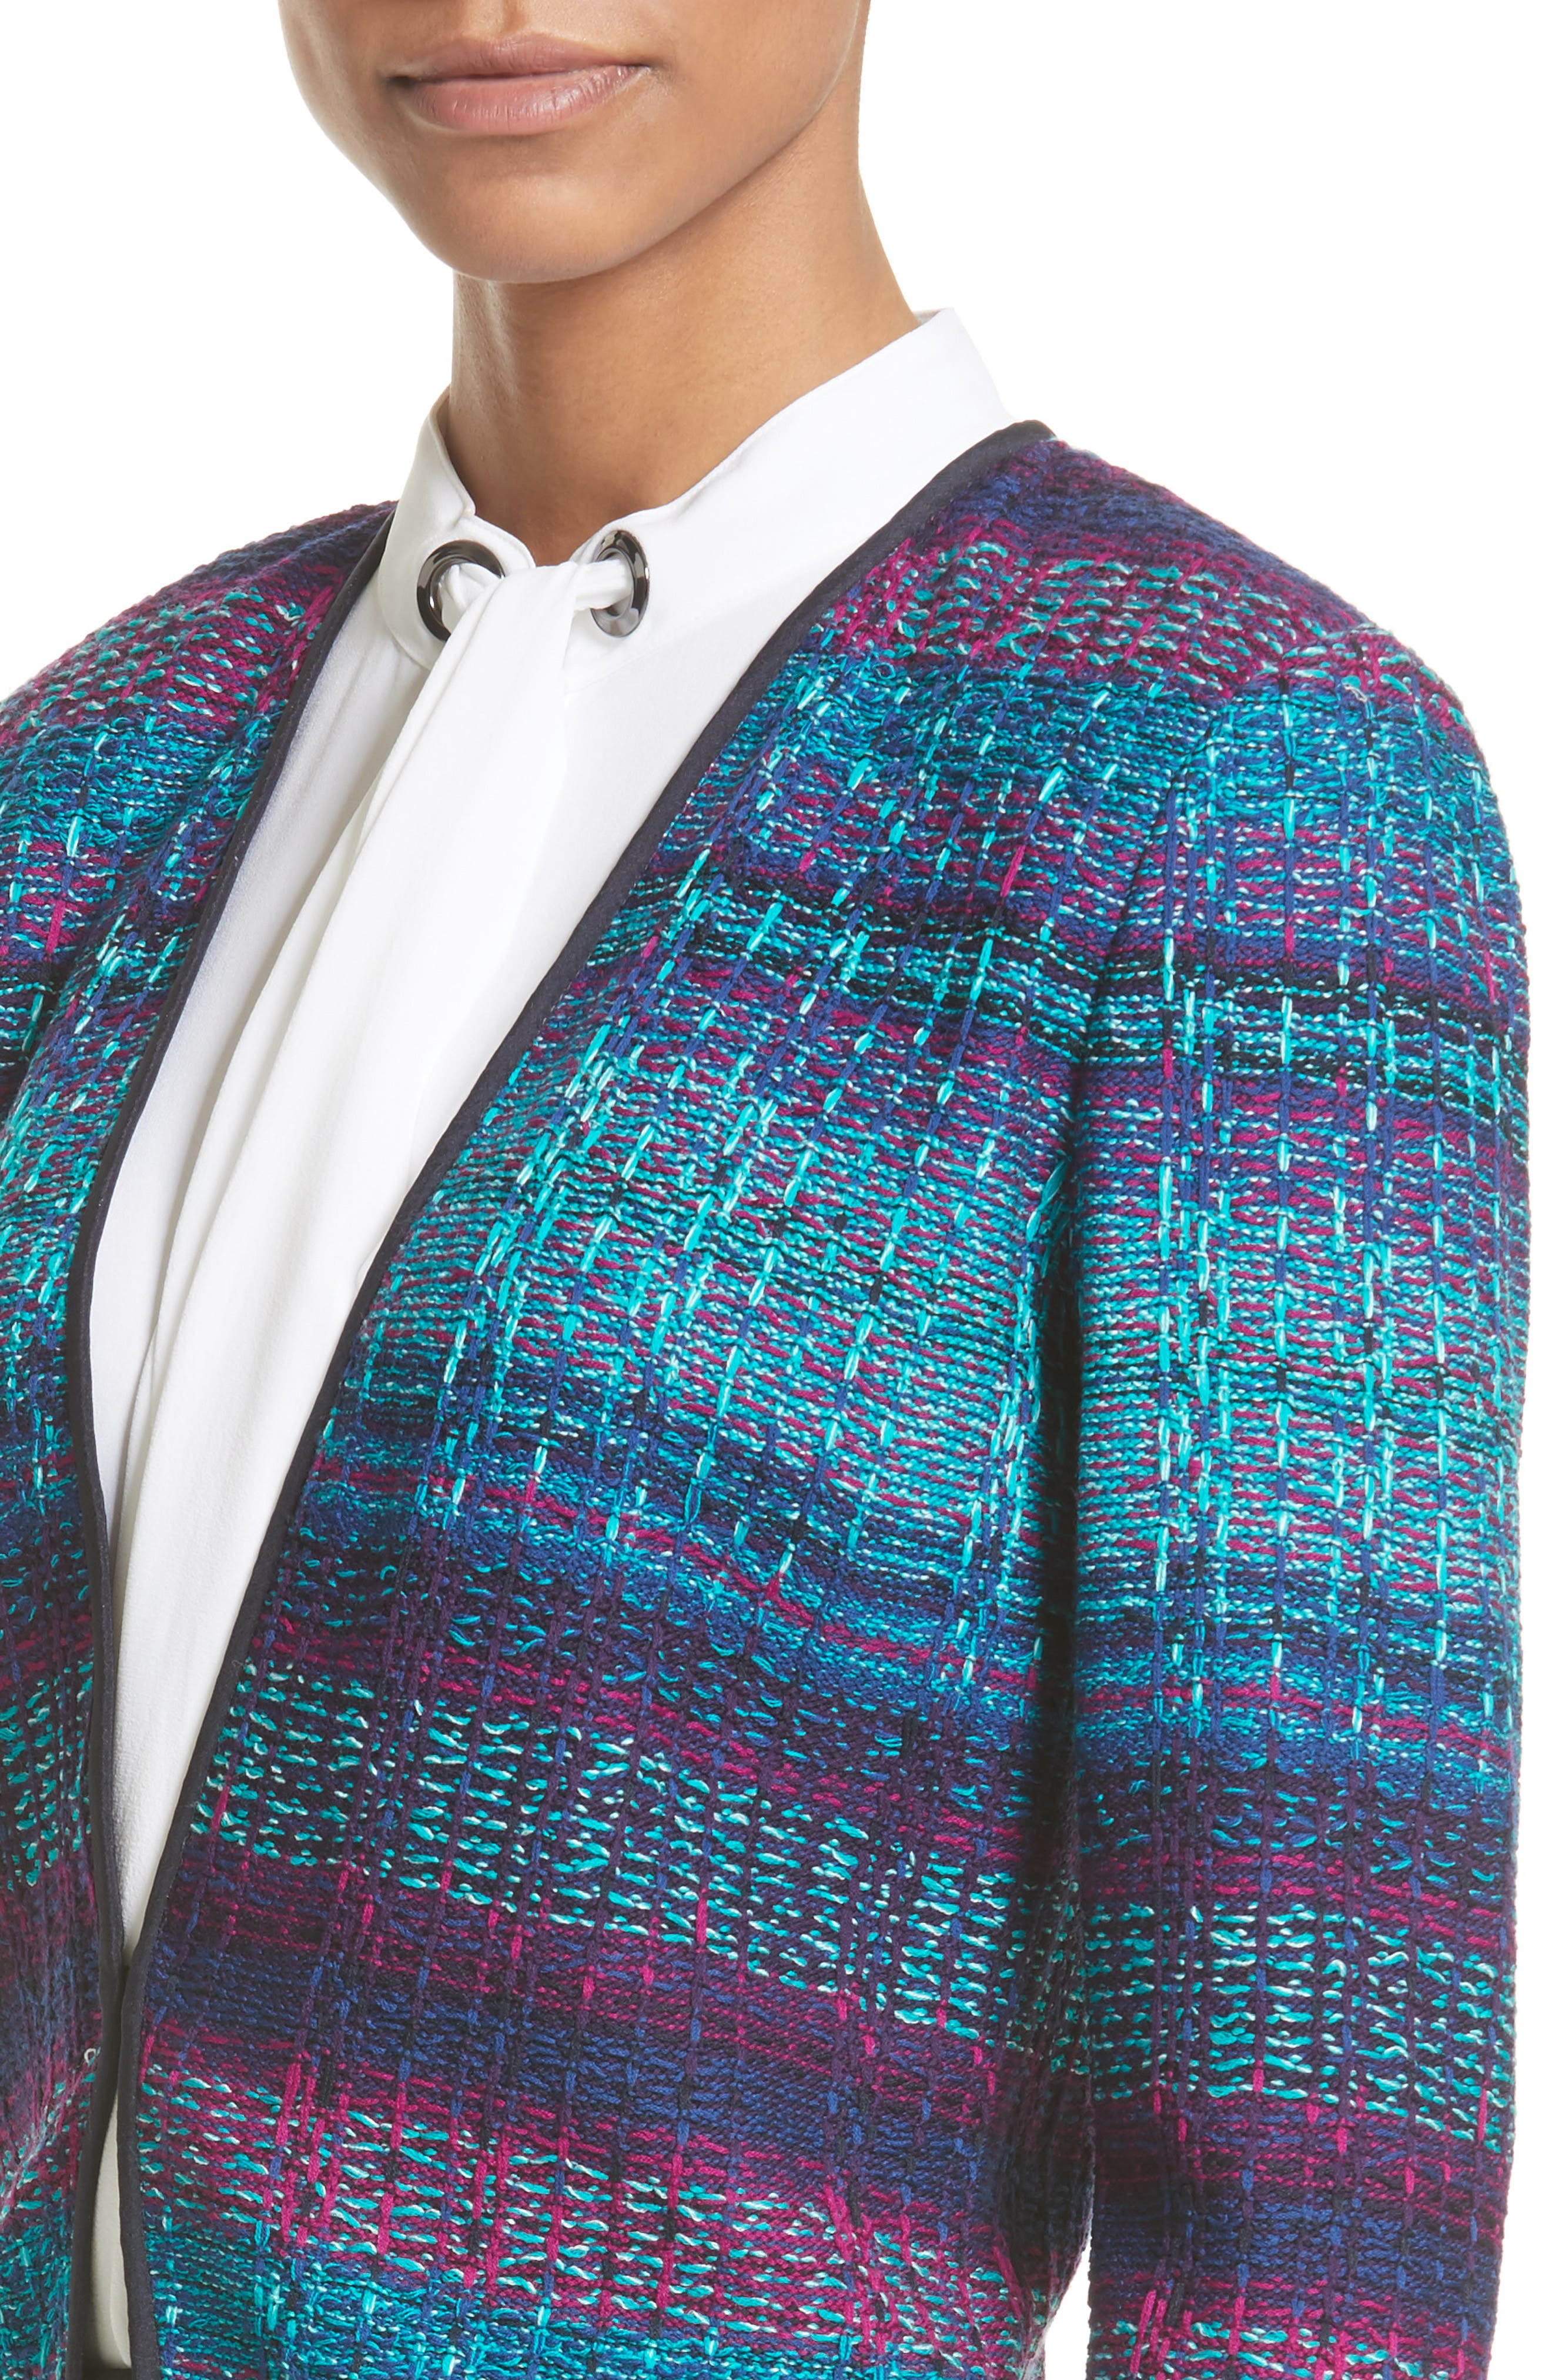 Ellah Knit Jacket,                             Alternate thumbnail 4, color,                             Navy Multi